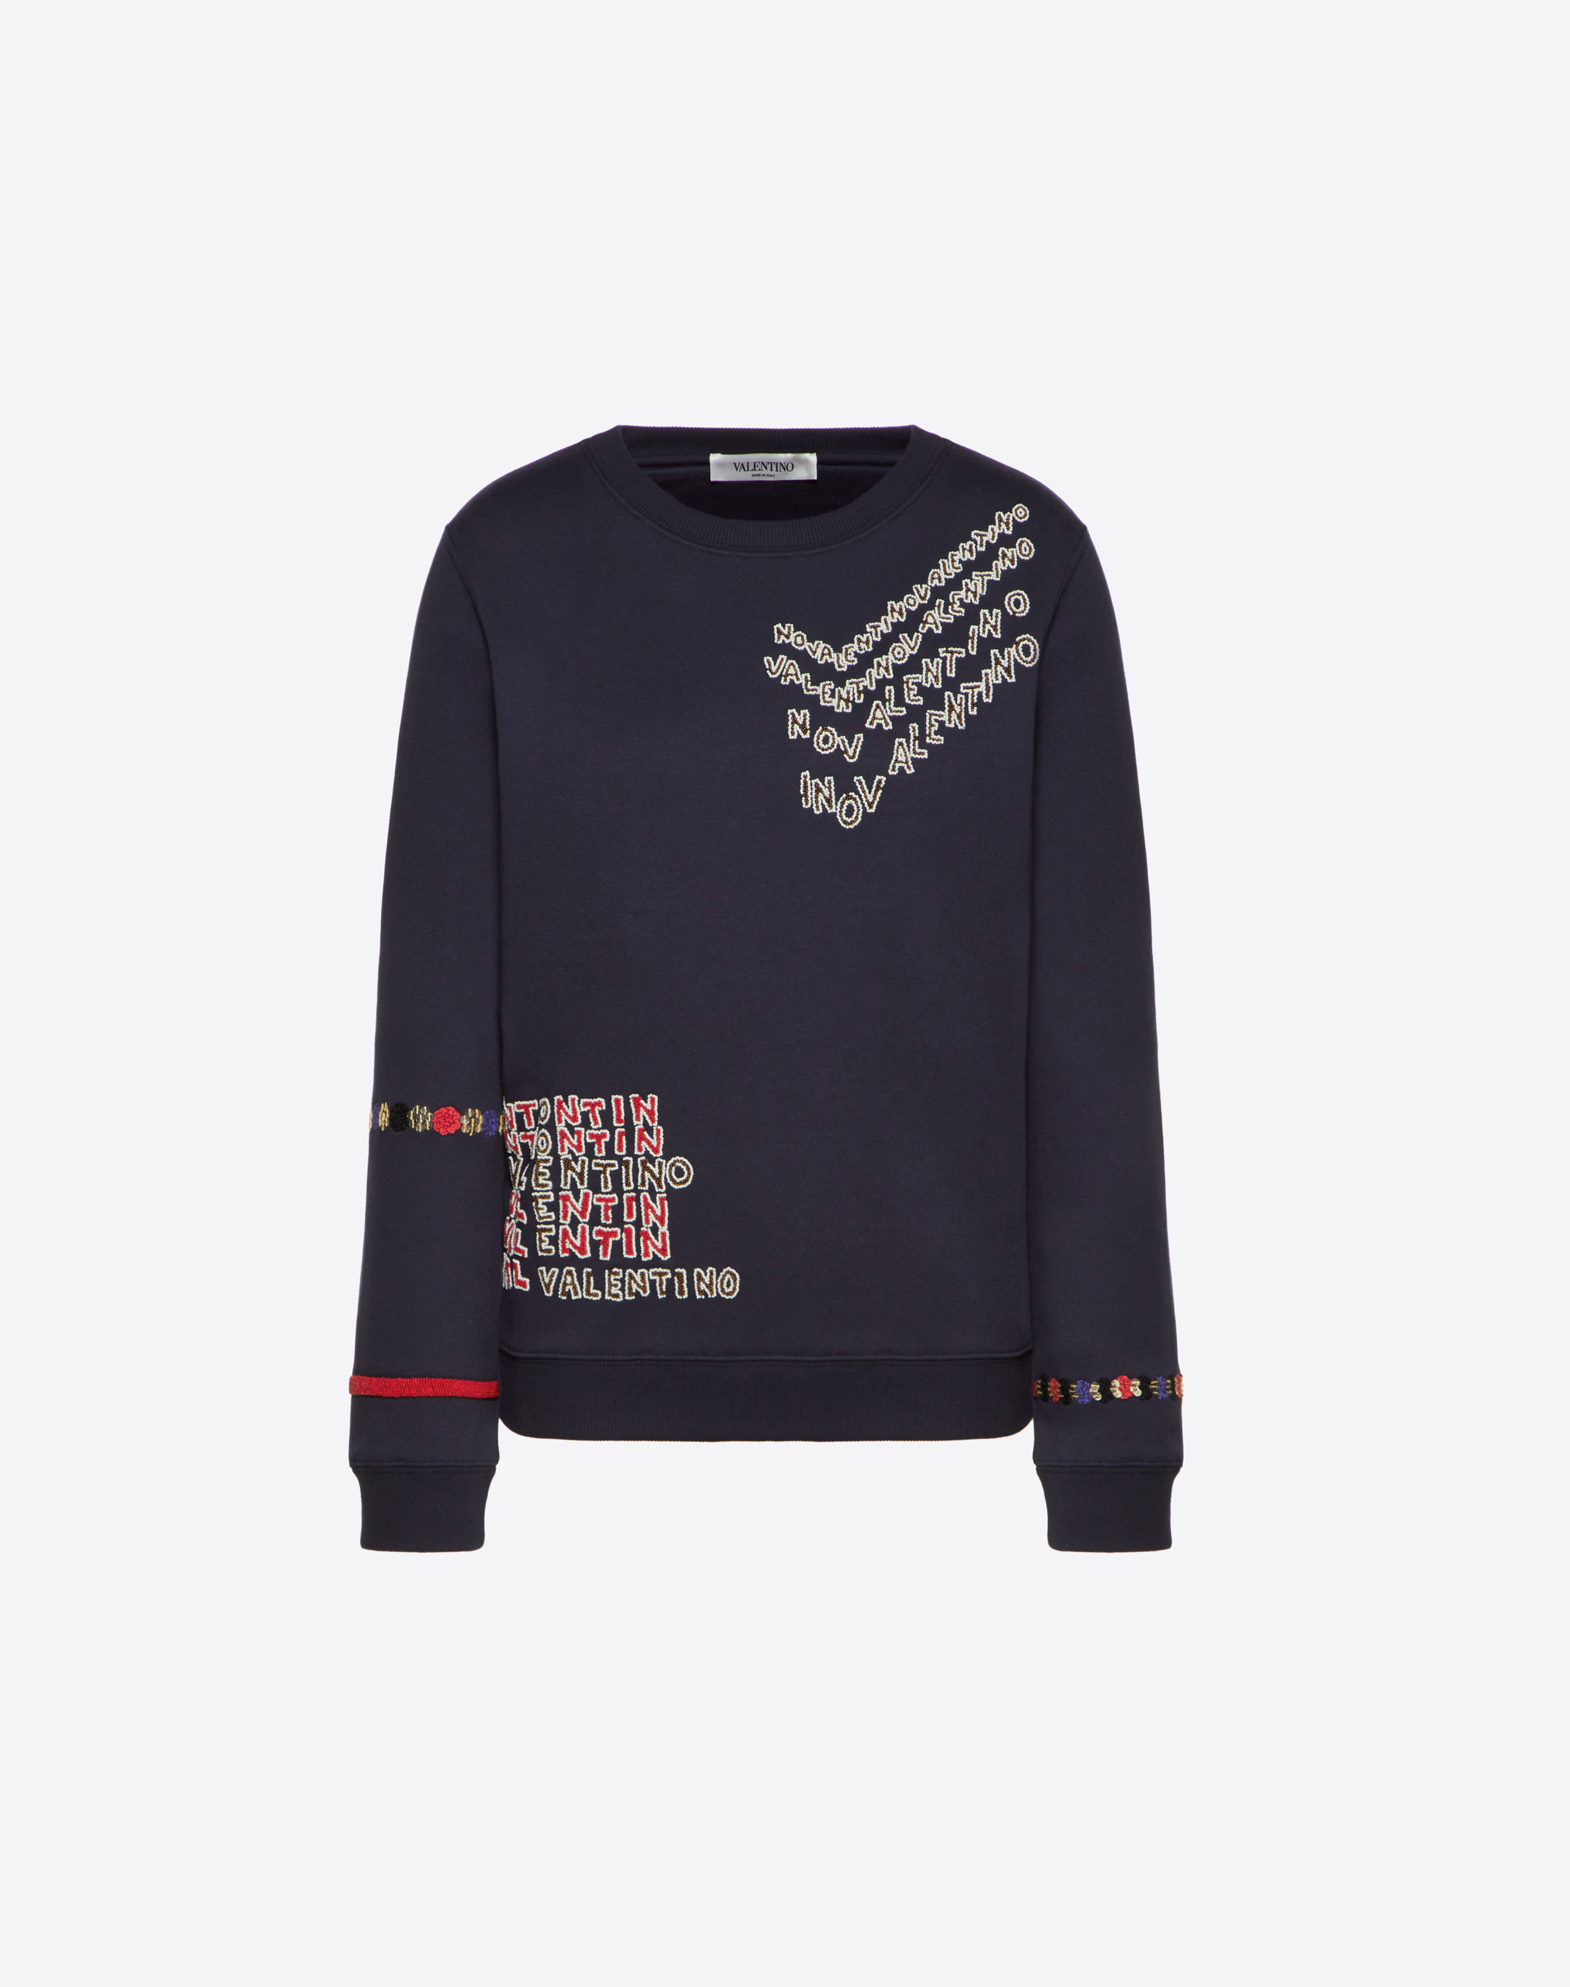 Valentino Chevron and Valentino Puzzle Embroidered Cotton Jersey Sweatshirt